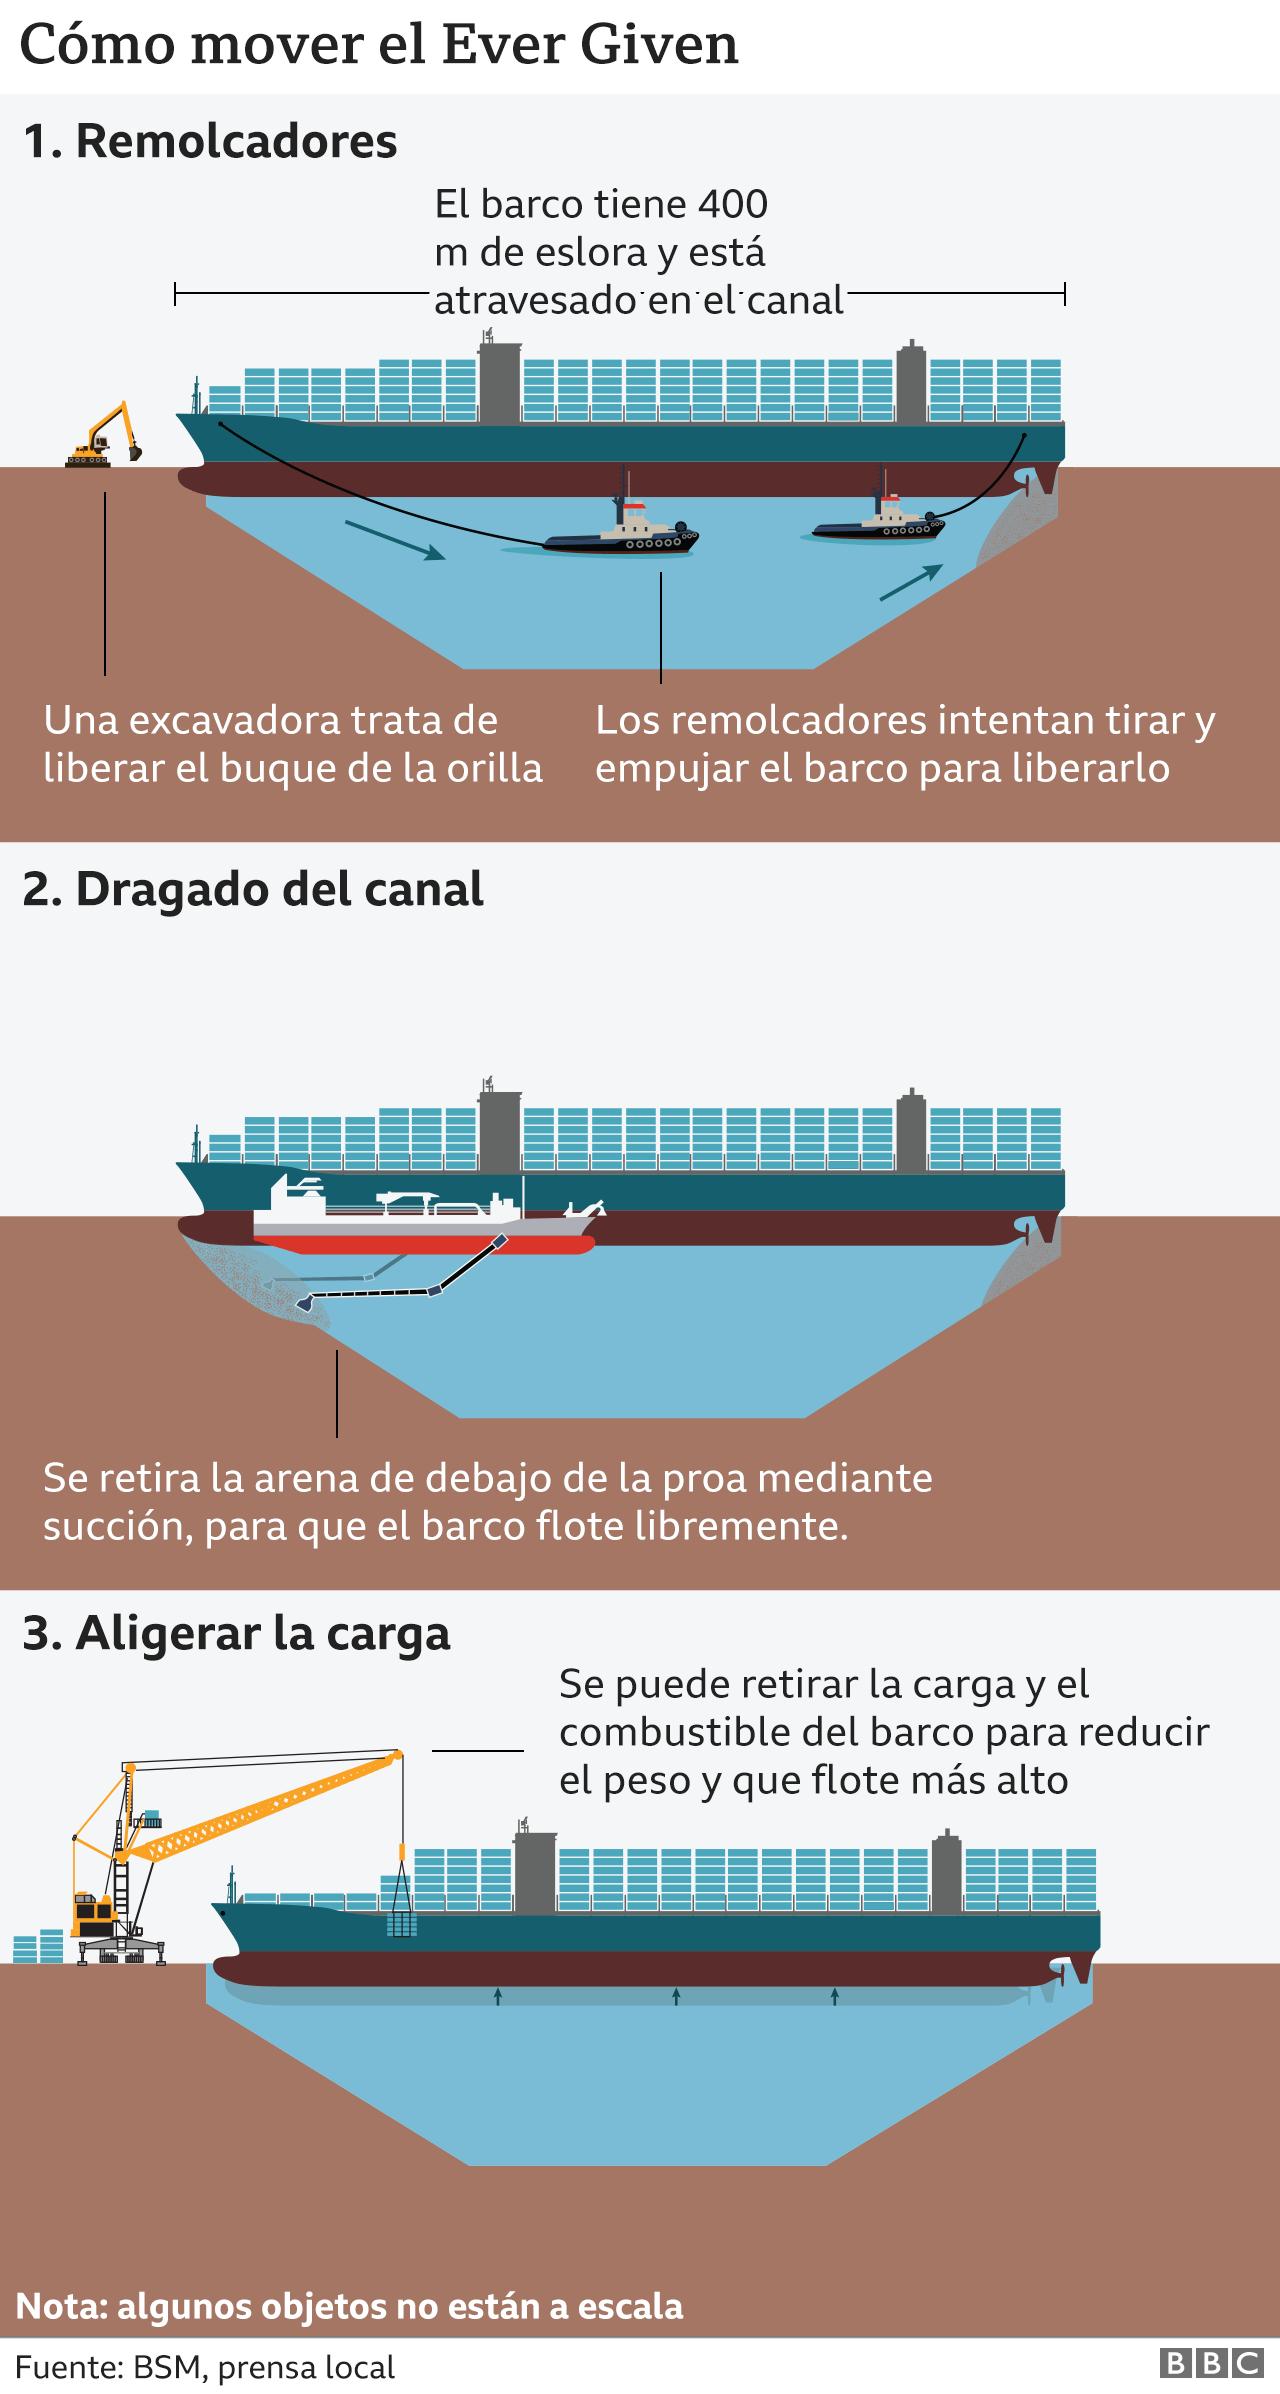 Opciones para liberar el barco